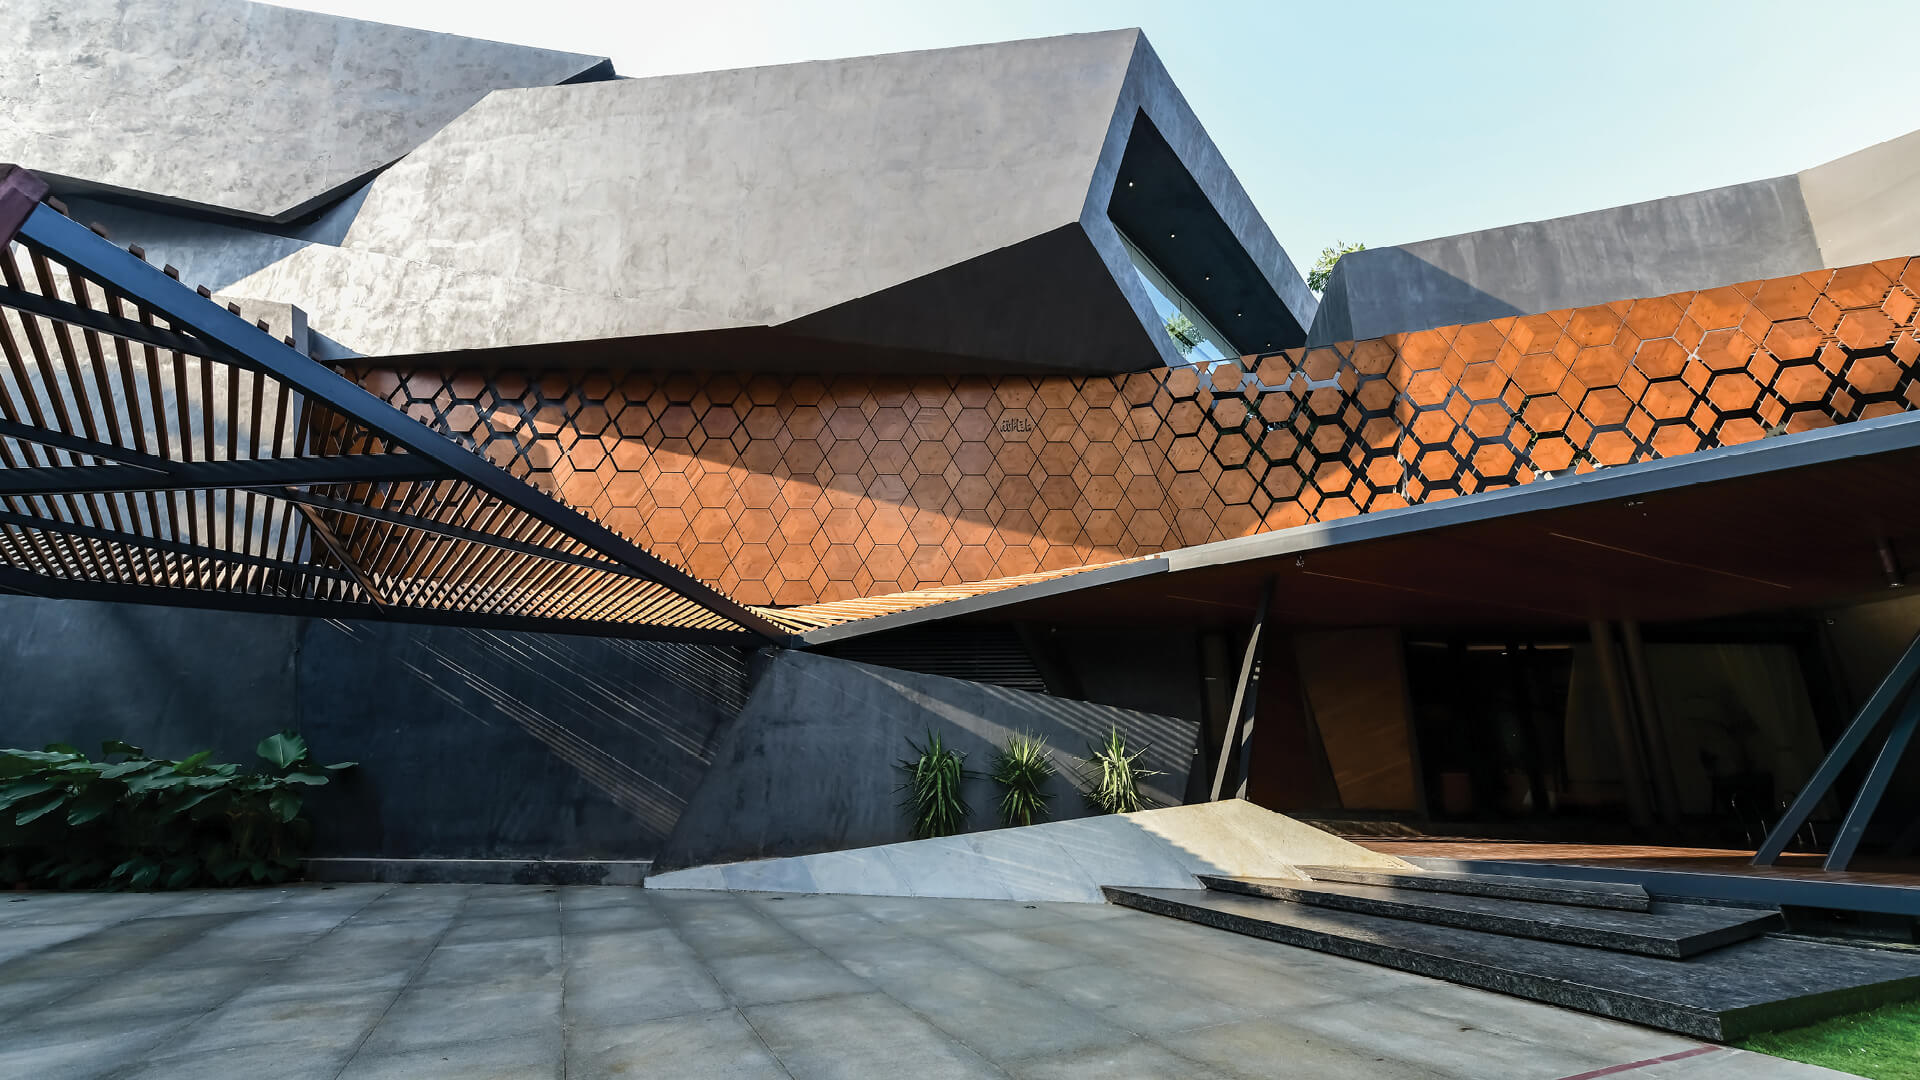 DA Studios' RH21 in Hyderabad, India, evokes rhythmic angular masses frozen in time